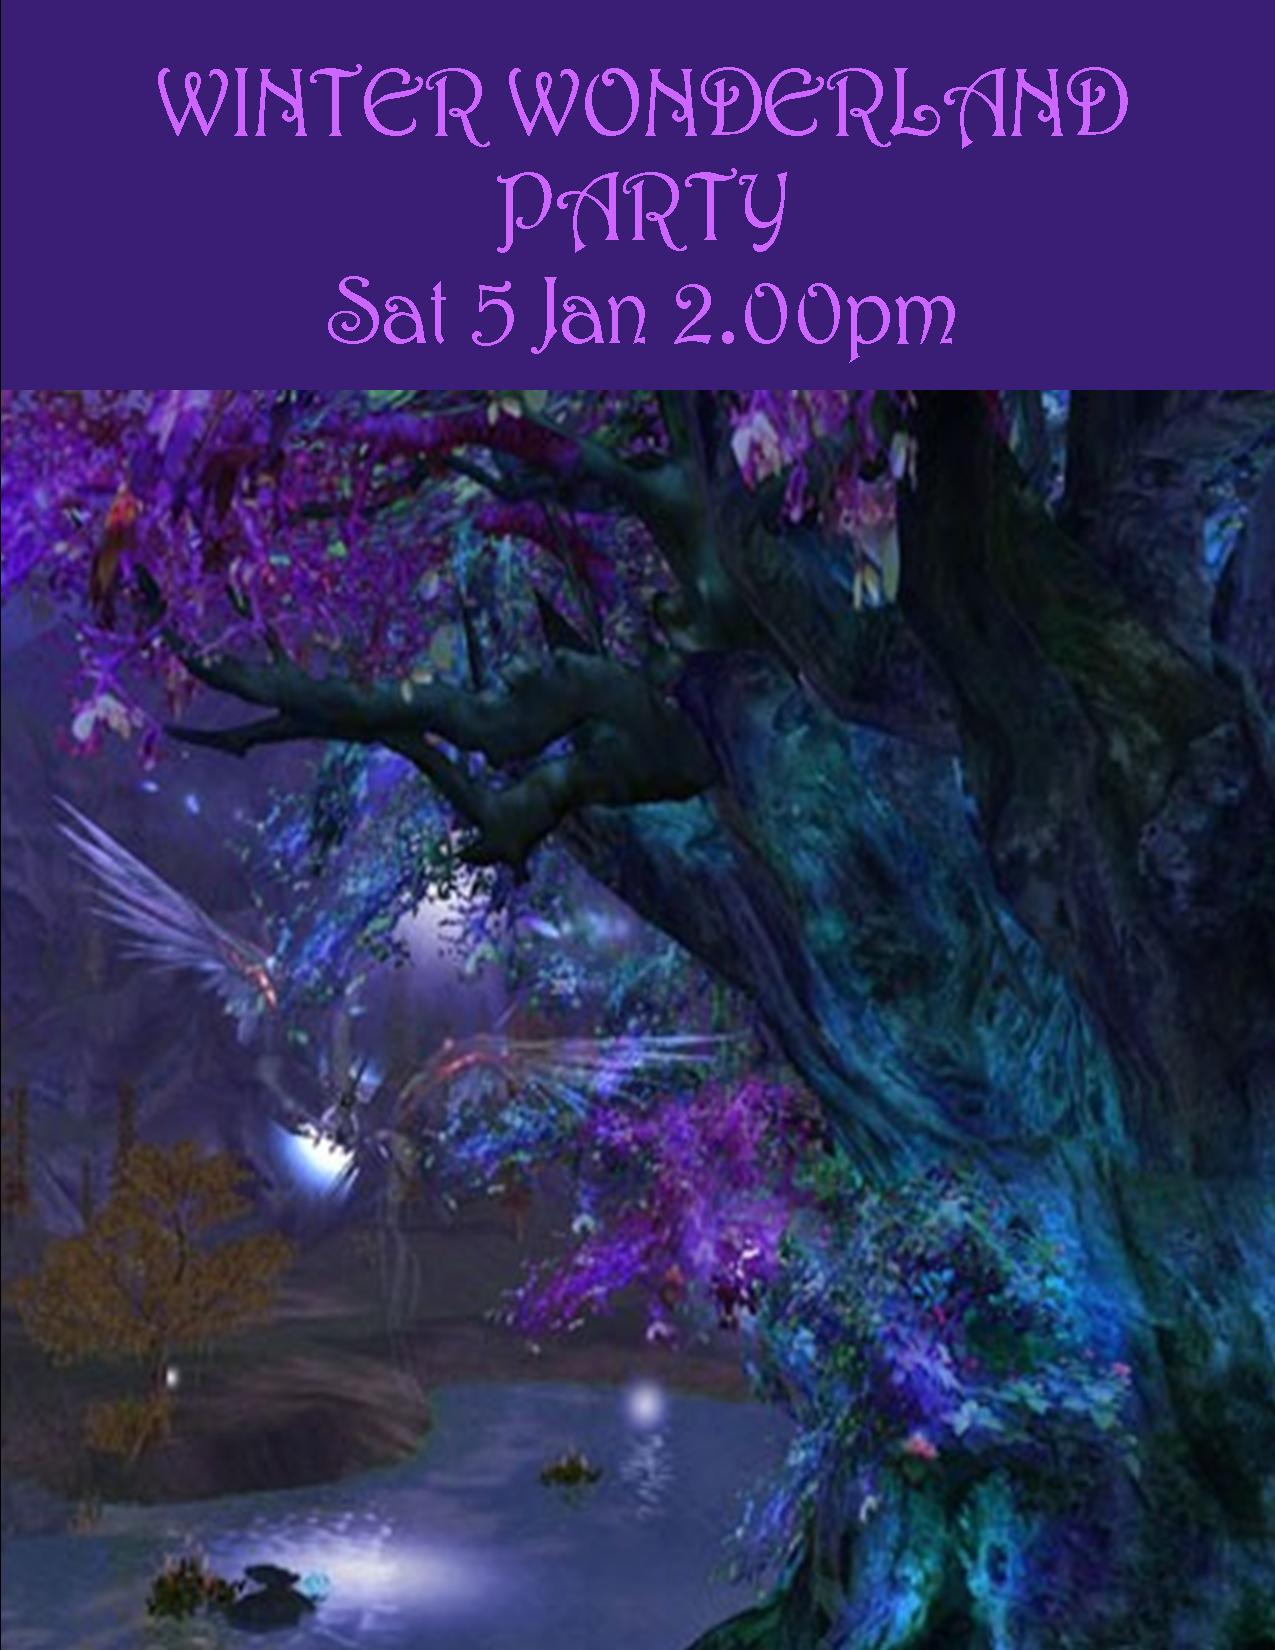 WINTER WONDERLAND PARTY POSTER SAT 5 JAN 2.00PM 2019